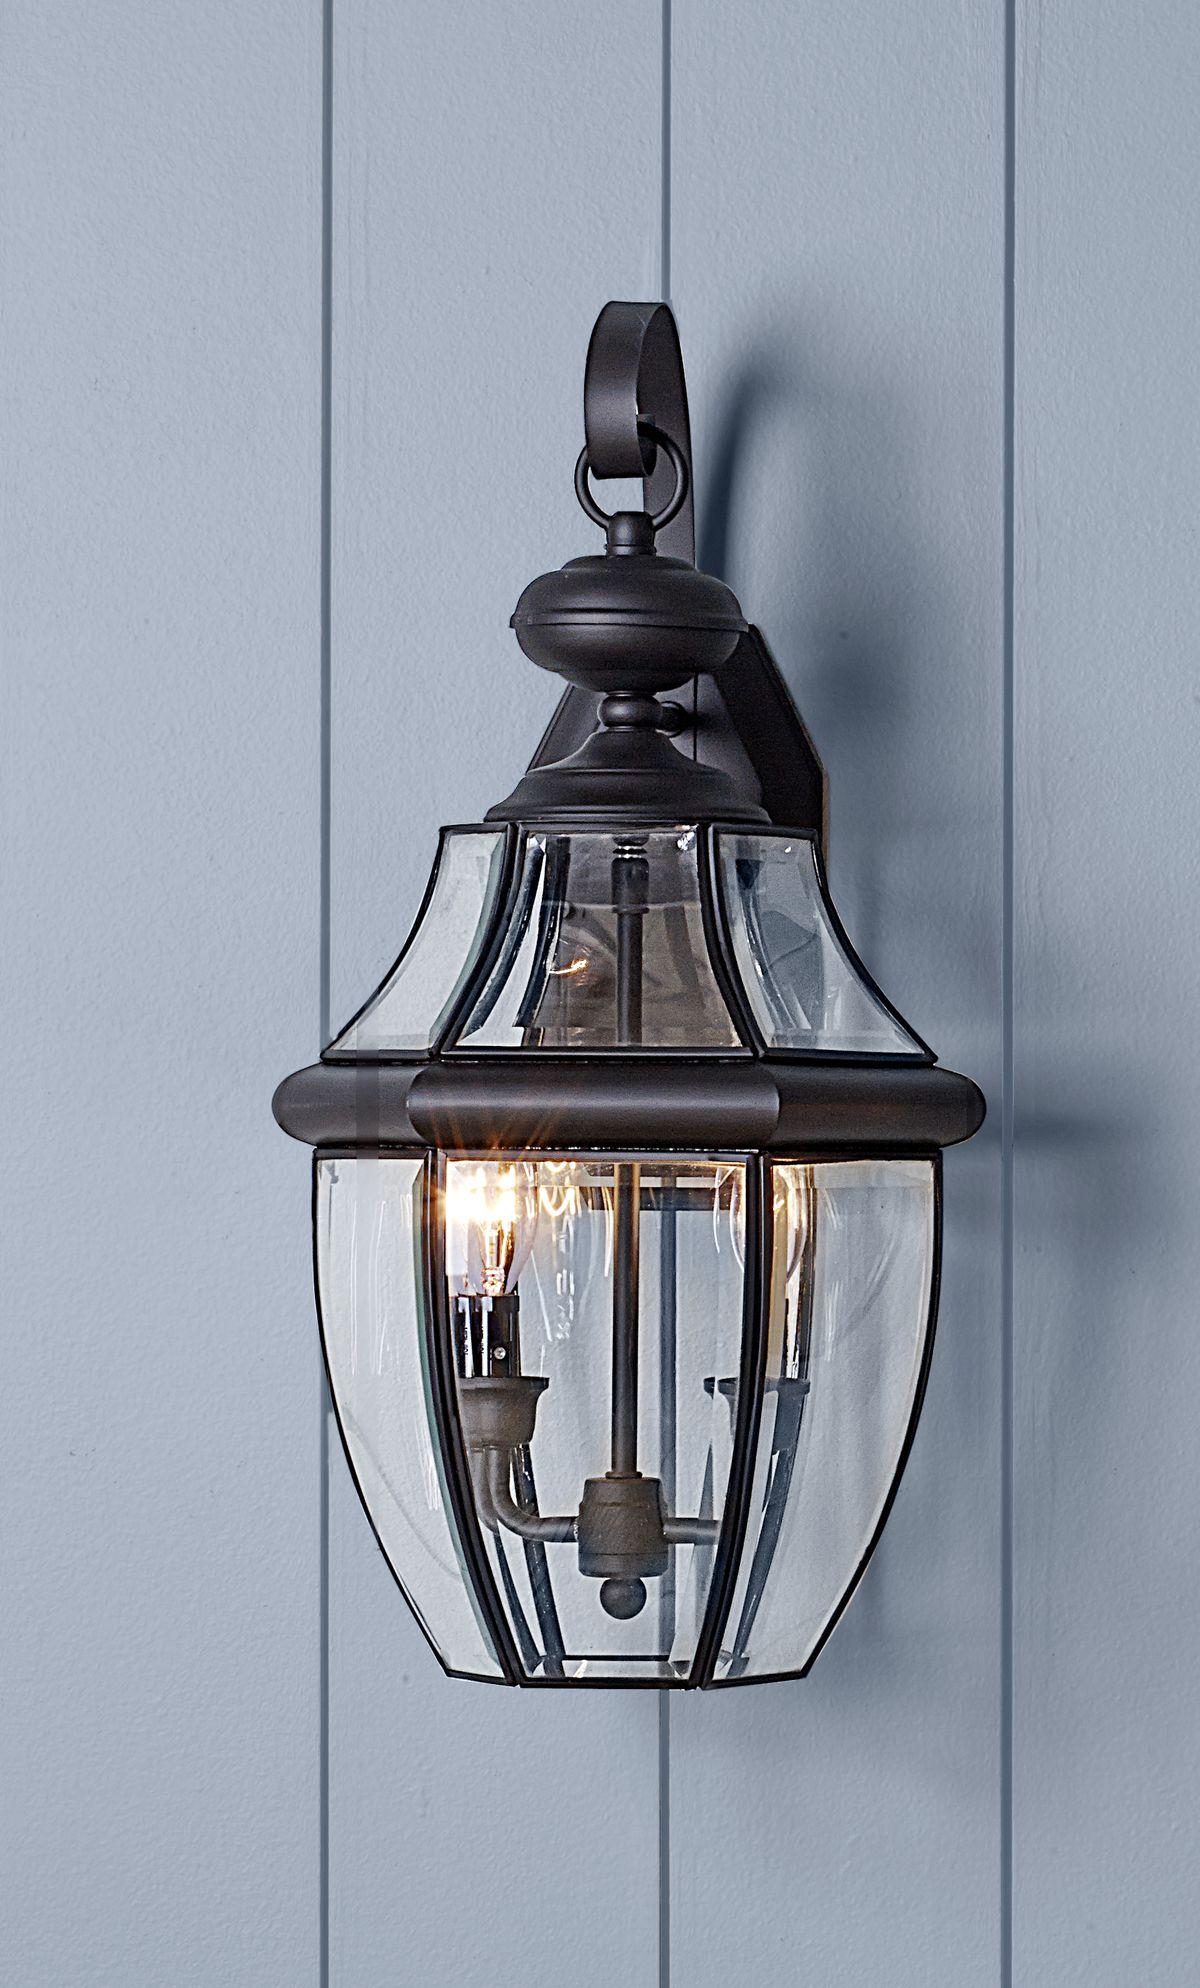 Quoizel Newbury 2-Light Outdoor Wall Lantern